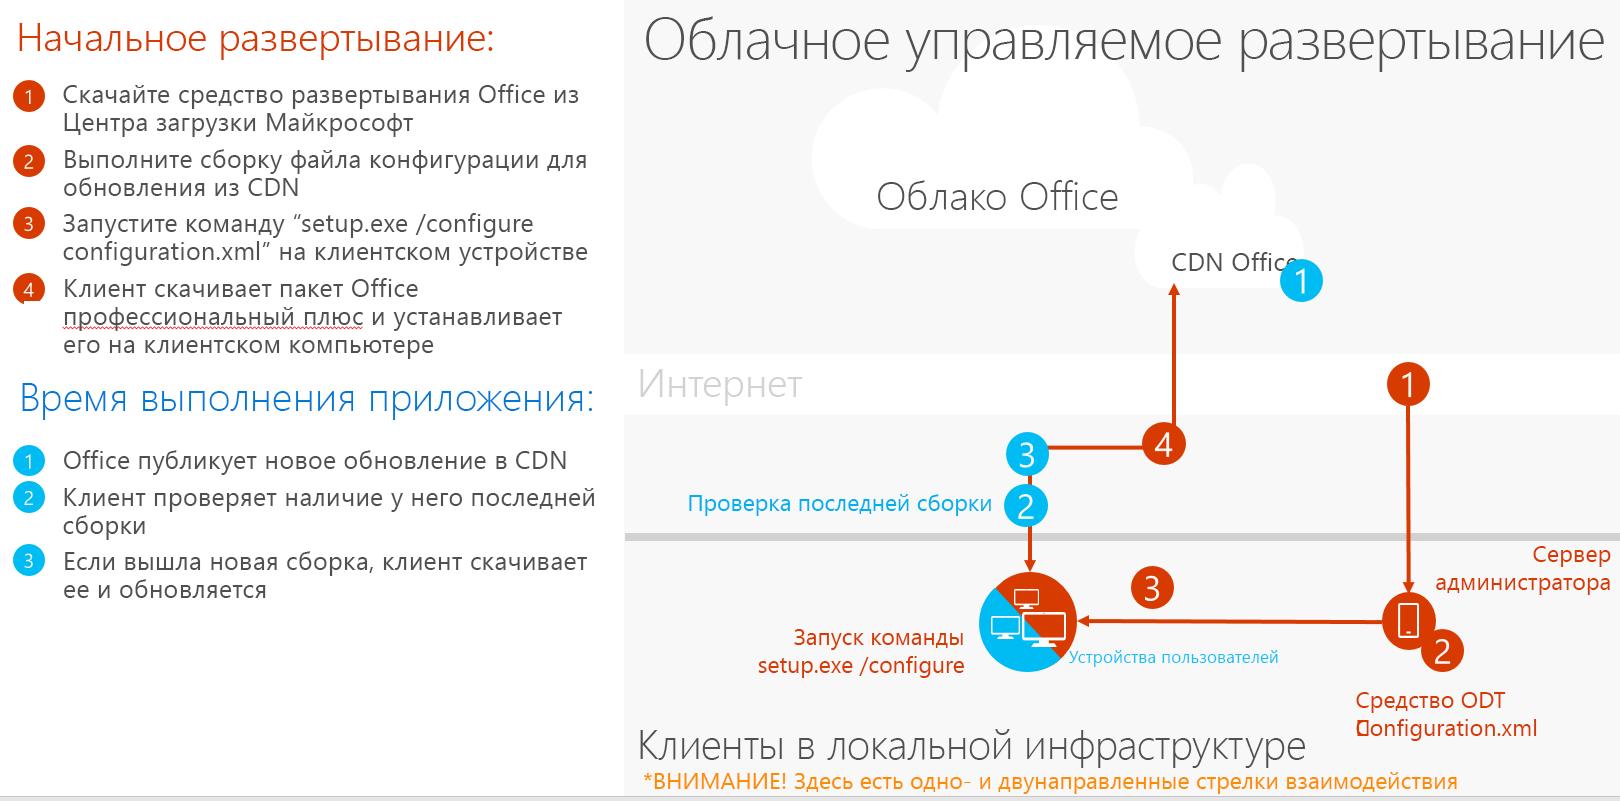 Развертывание с среде Cloud Managed